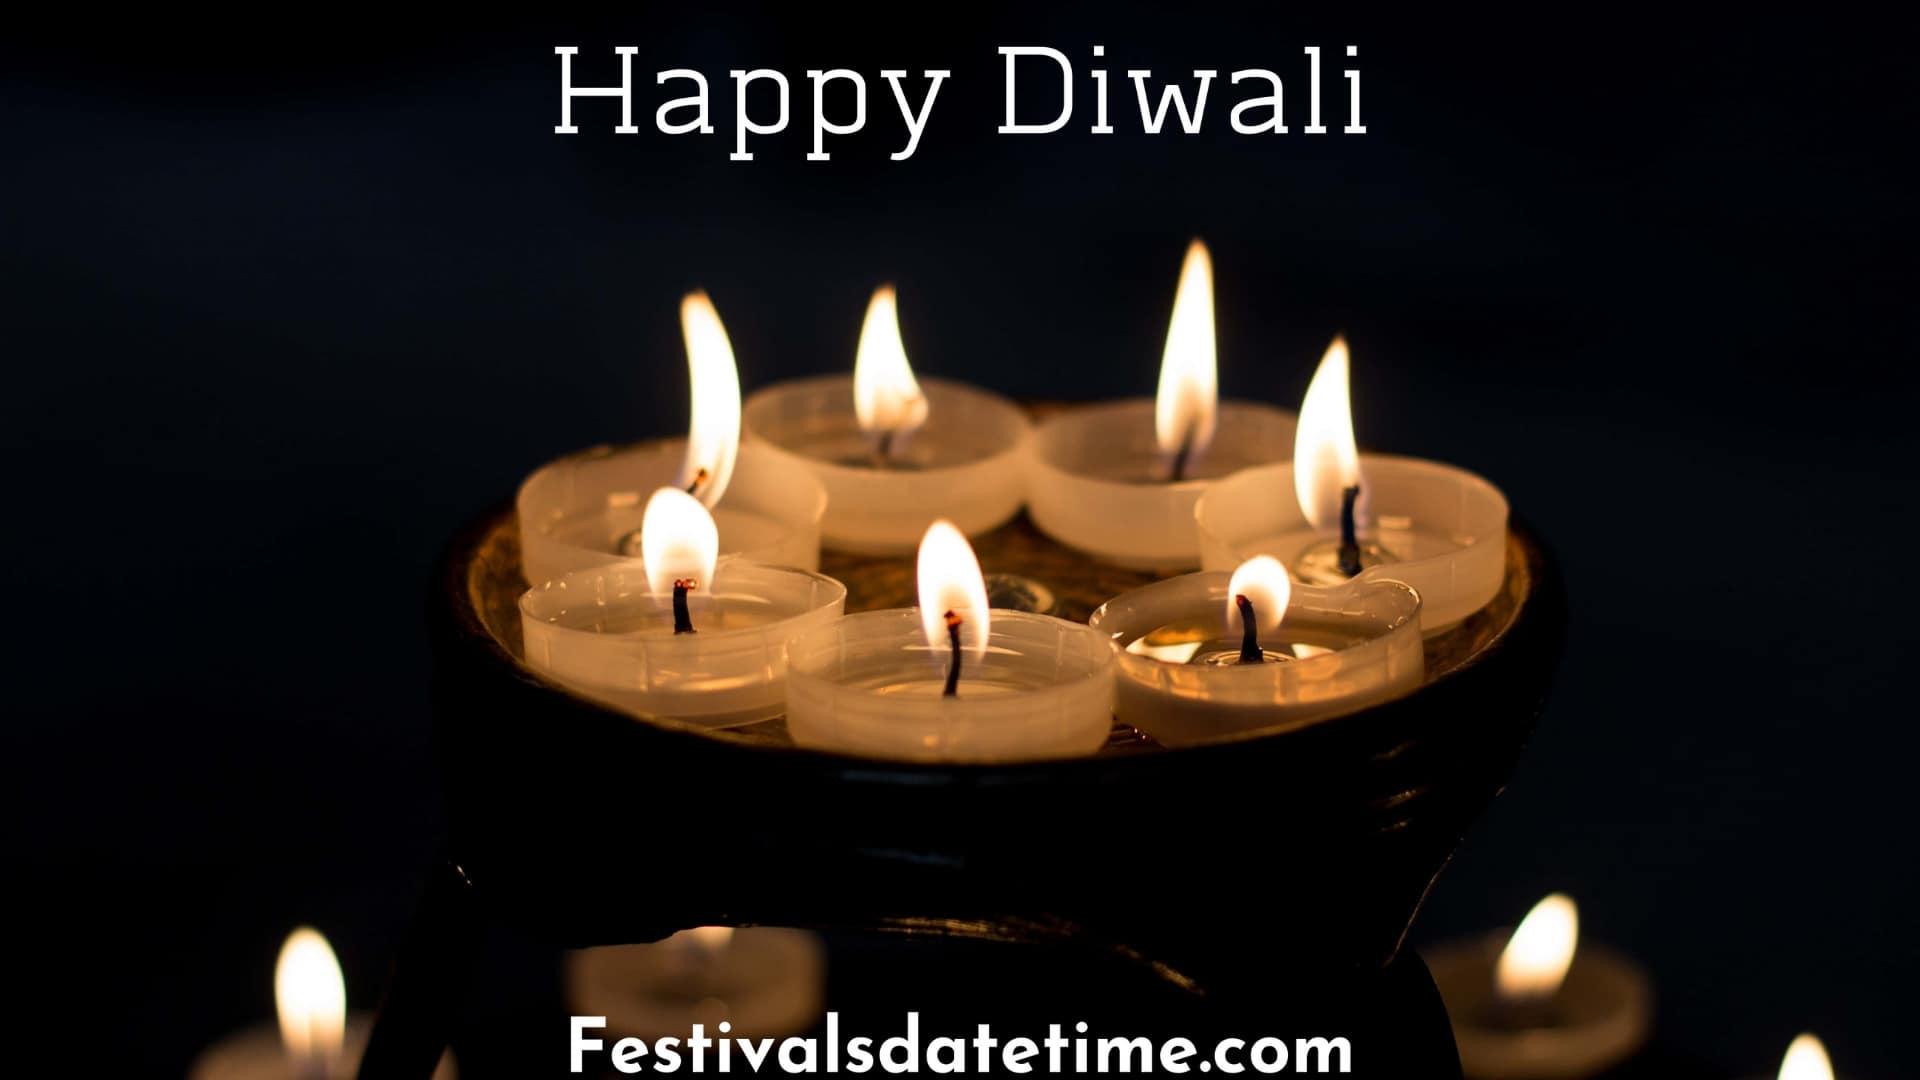 diwali_wallpaper_for_desktop